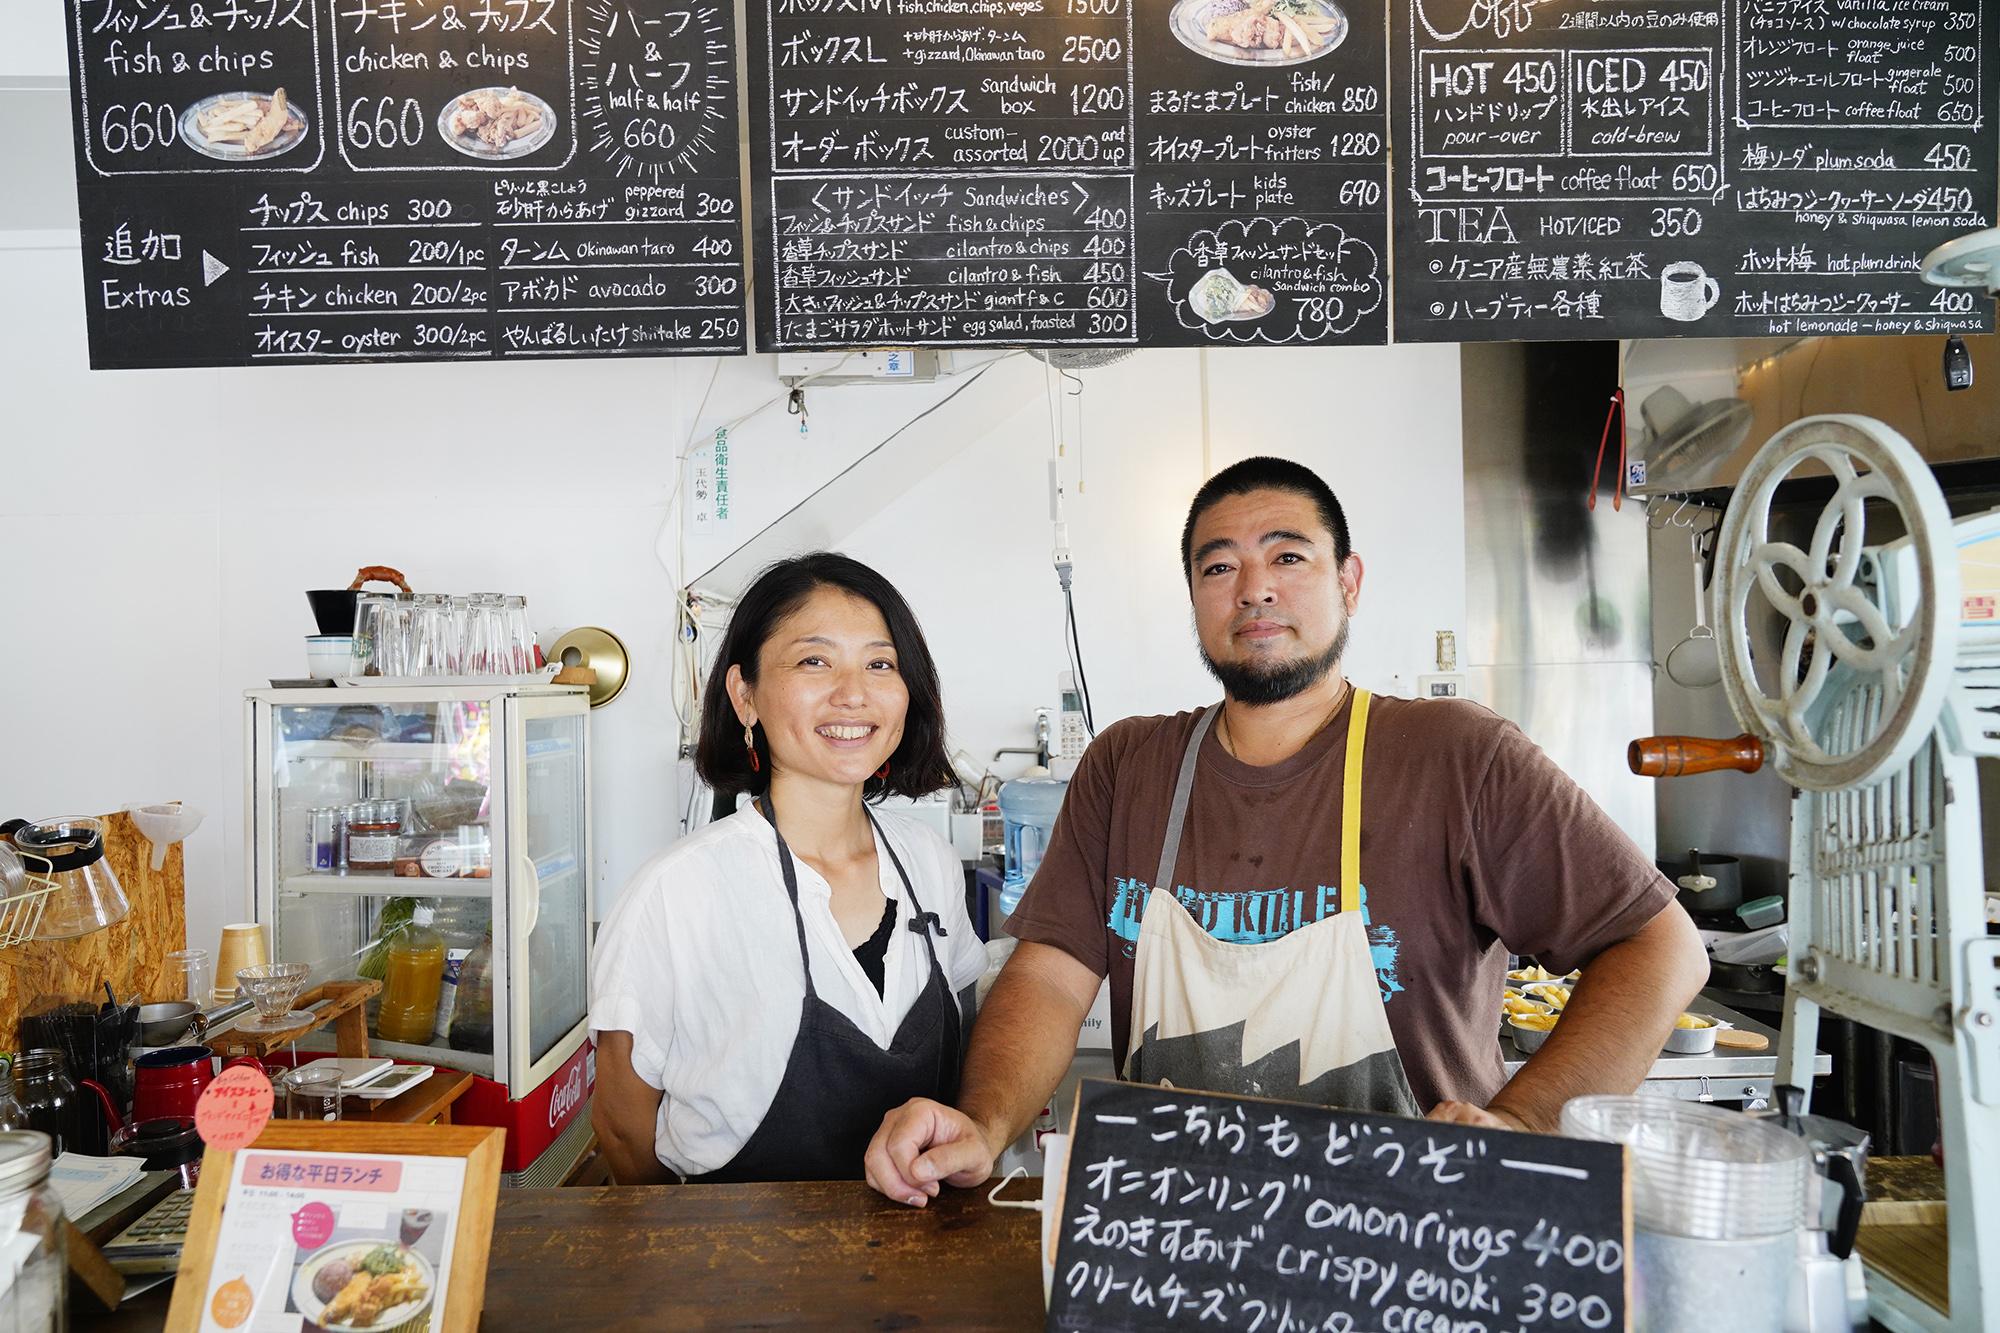 「fish & chips まるたま」玉代勢卓さん・藍さんご夫妻 / 那覇市曙|このまちで生きる人 インタビュー